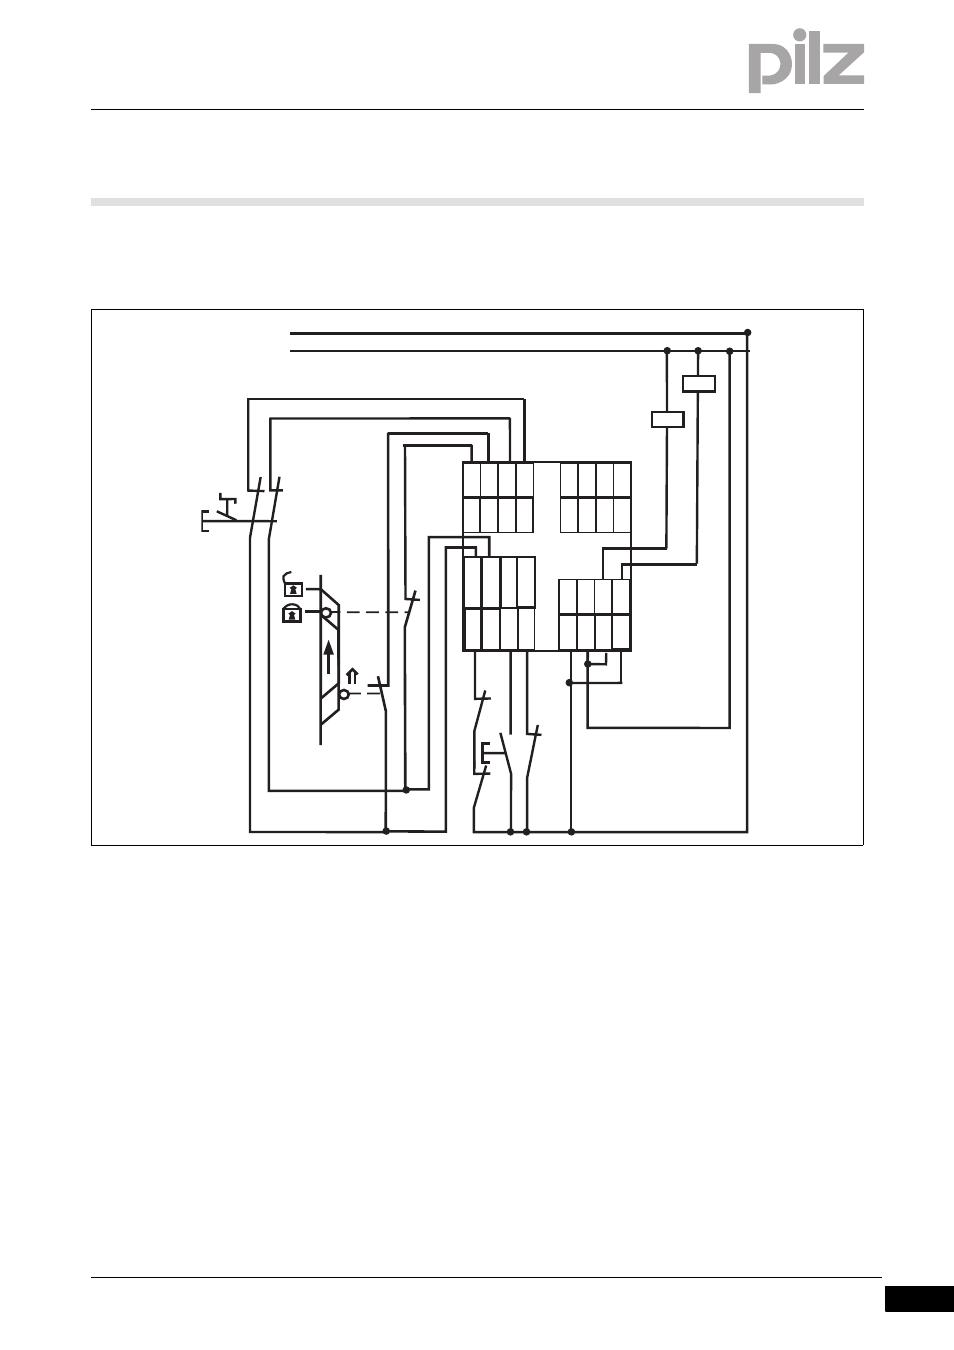 doc033 Pnoz S C Wiring Diagram on